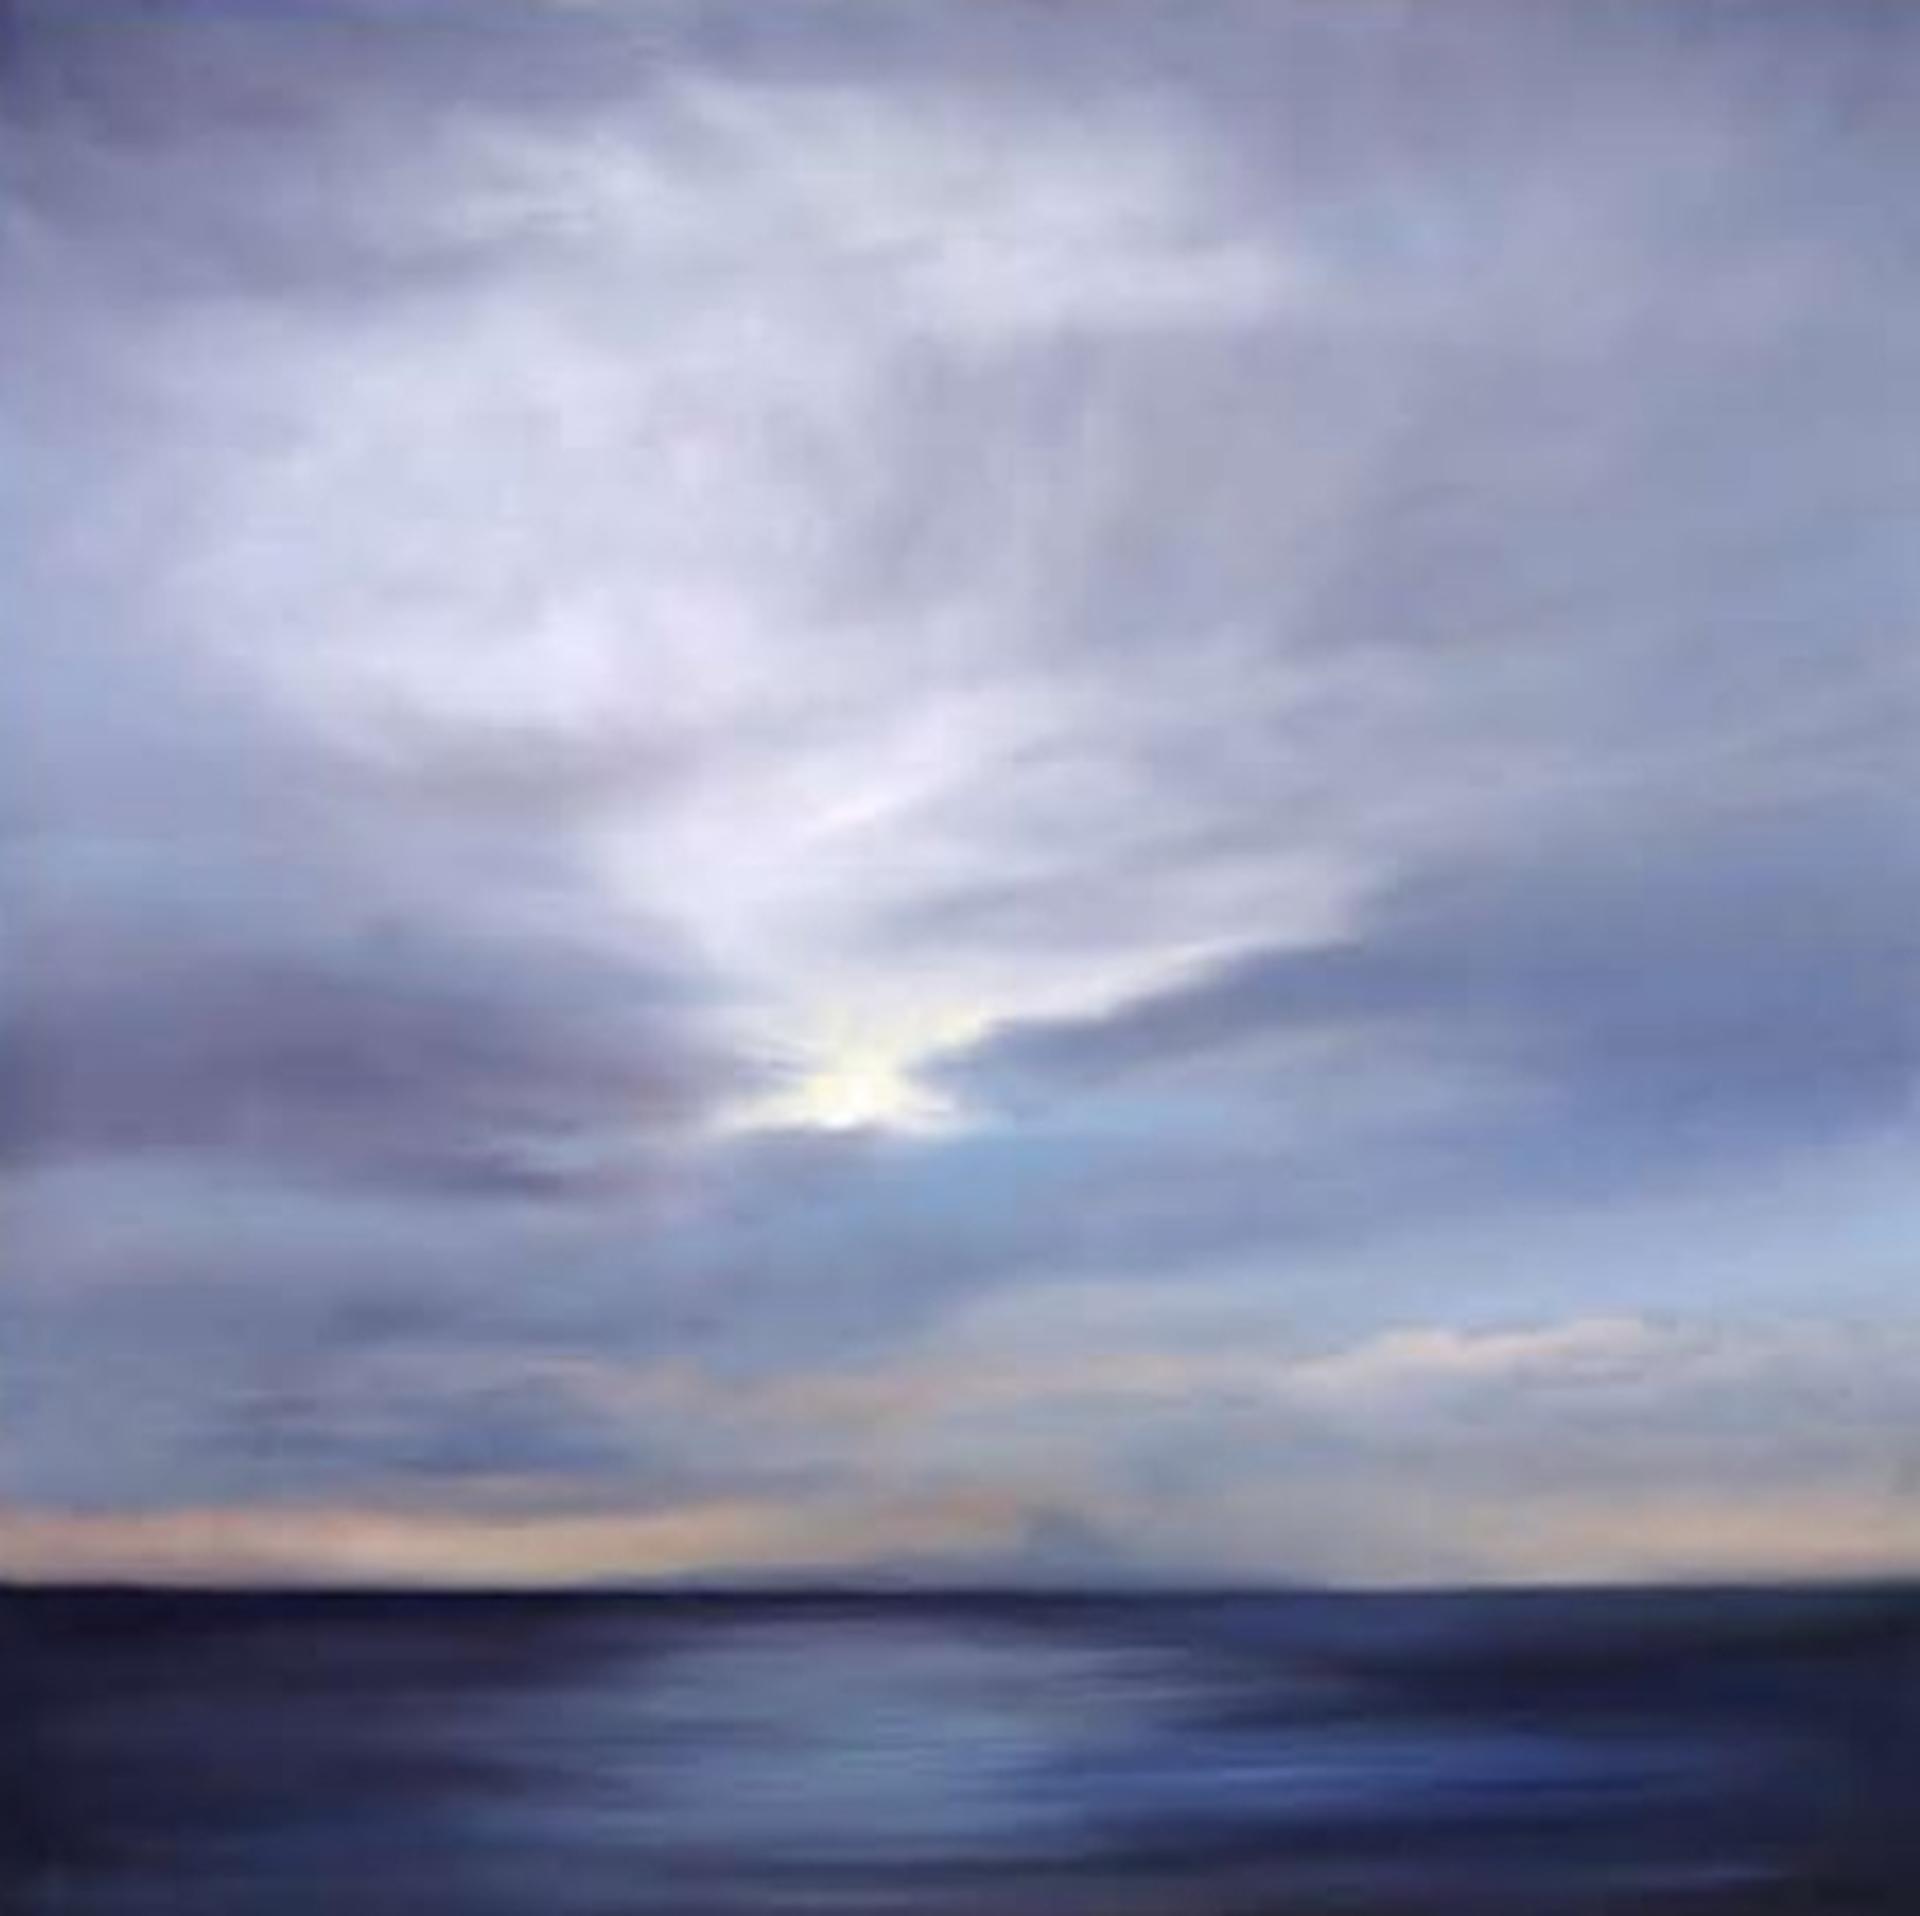 Our Peaceful Journey (SN) by Cheryl Kline